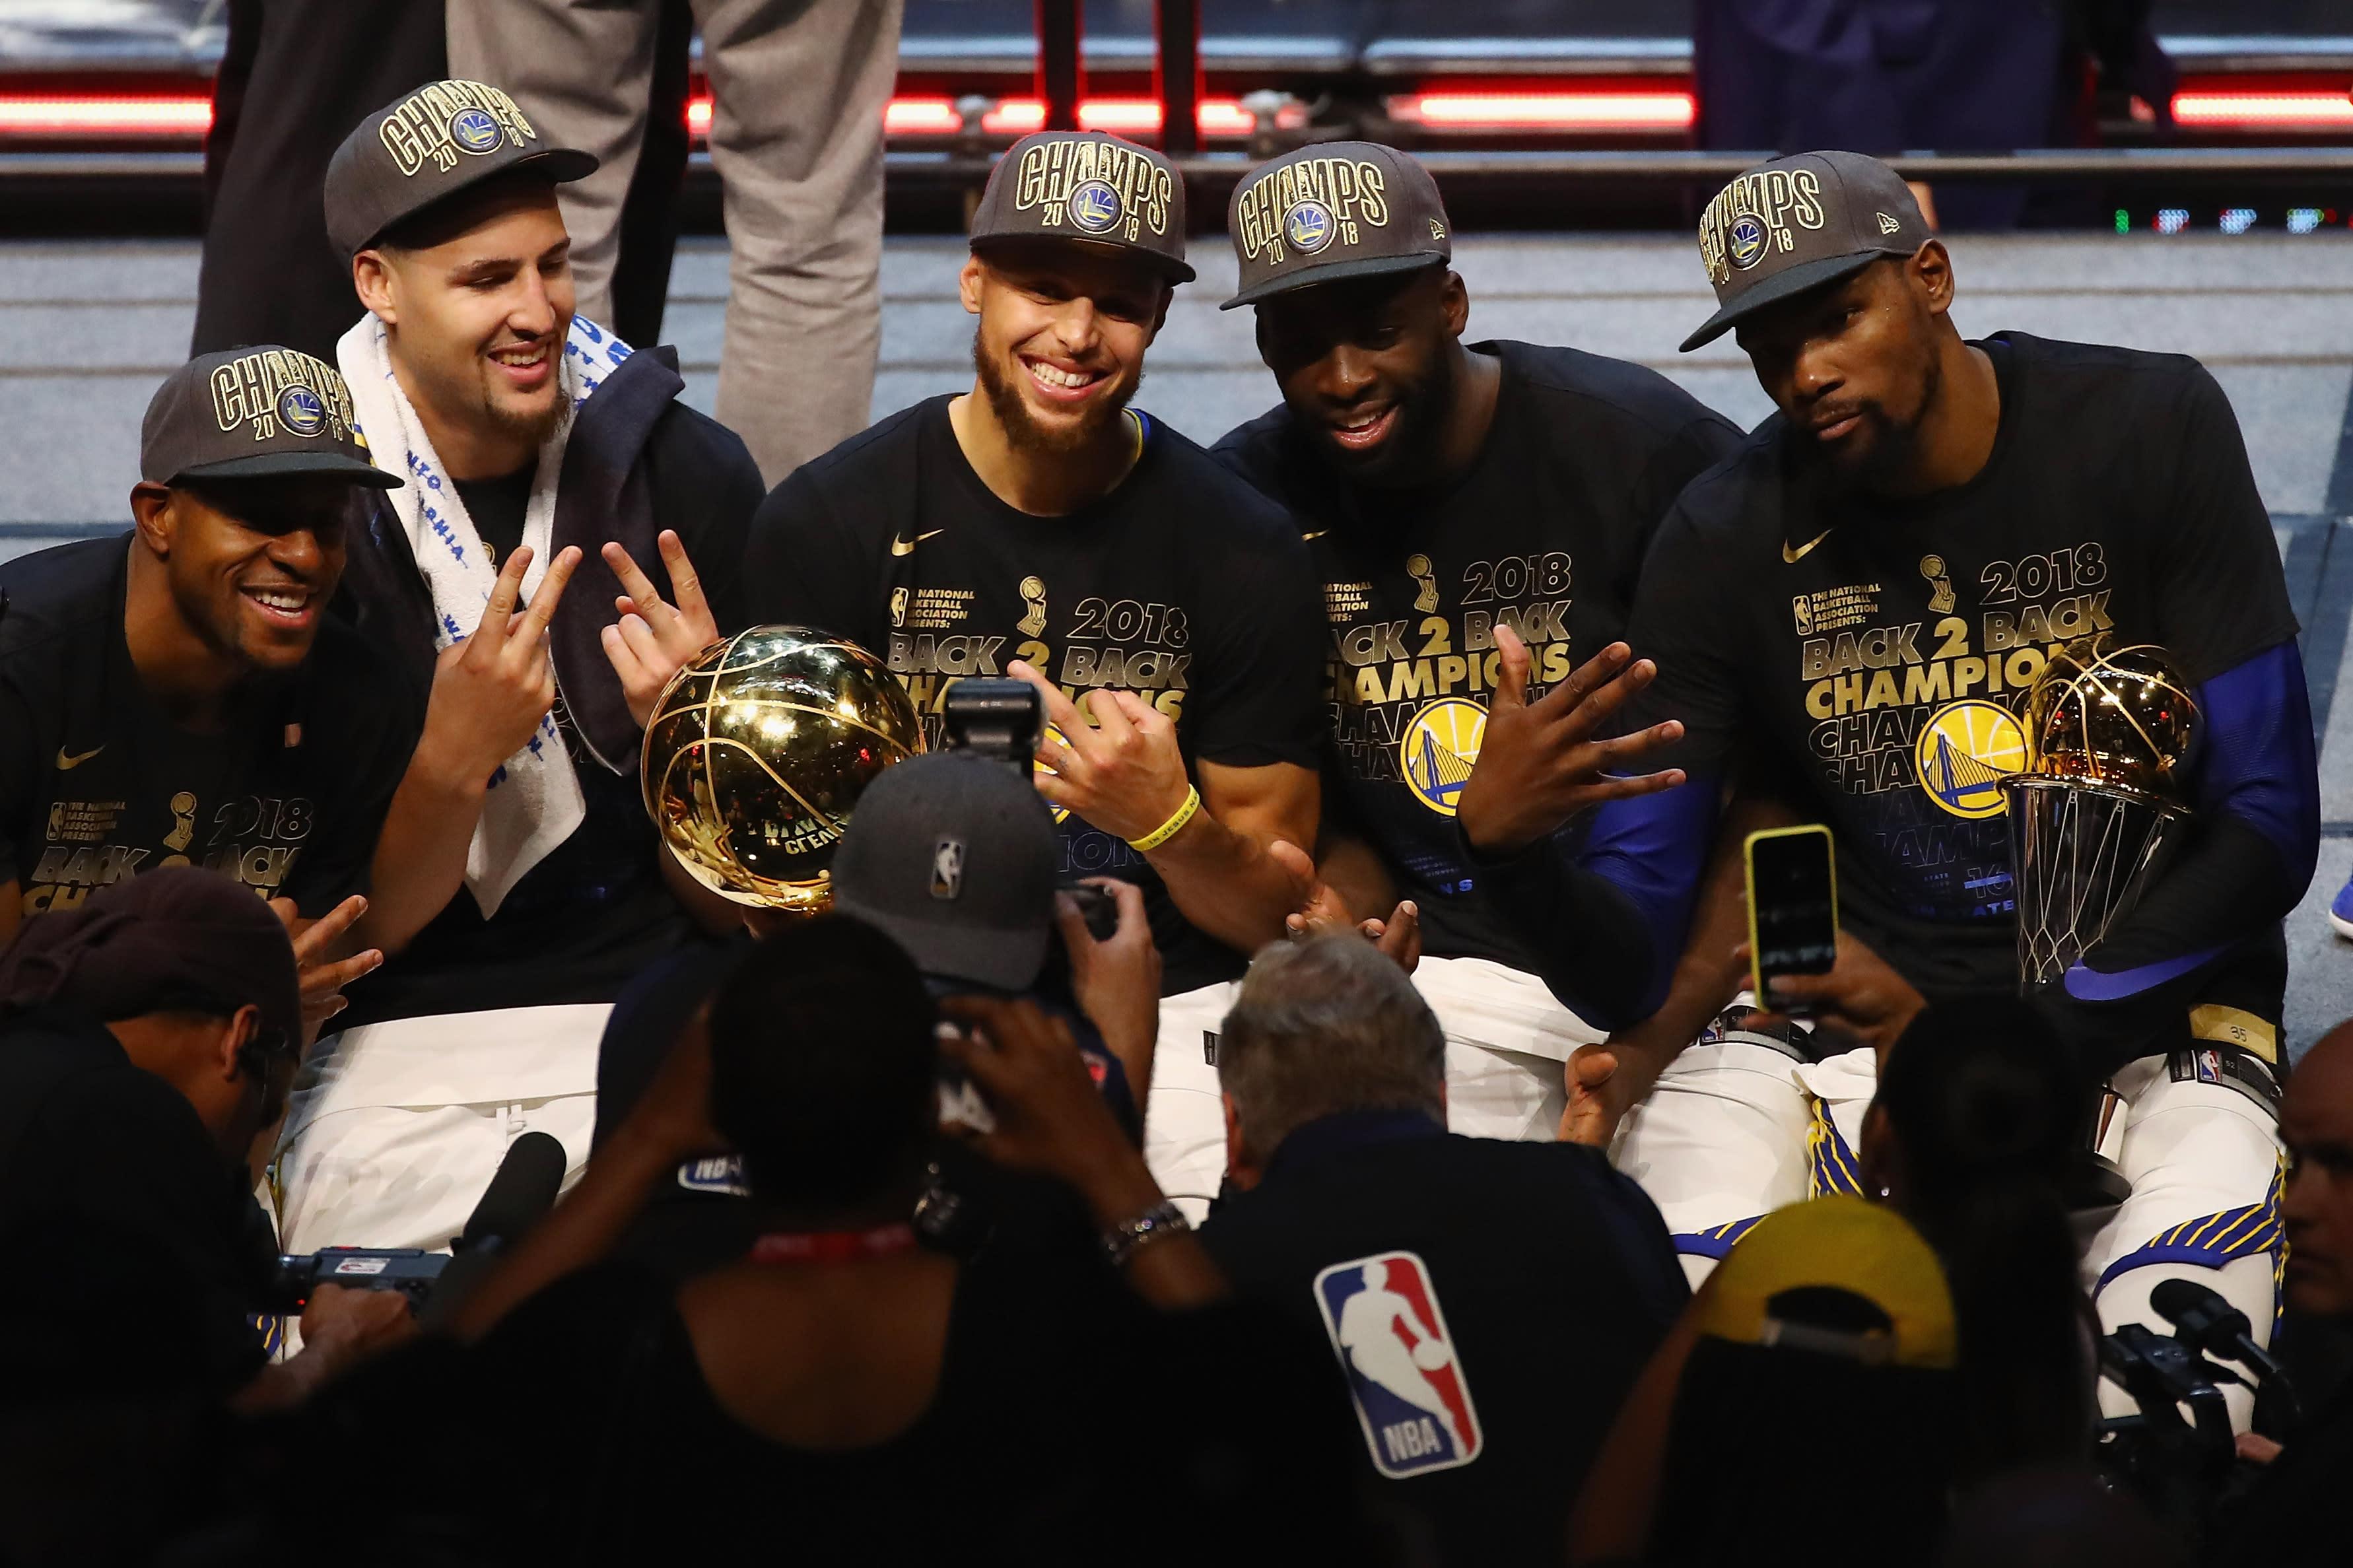 351f7639c60 Fantasy Basketball guide  Draft tips for 2018 NBA season